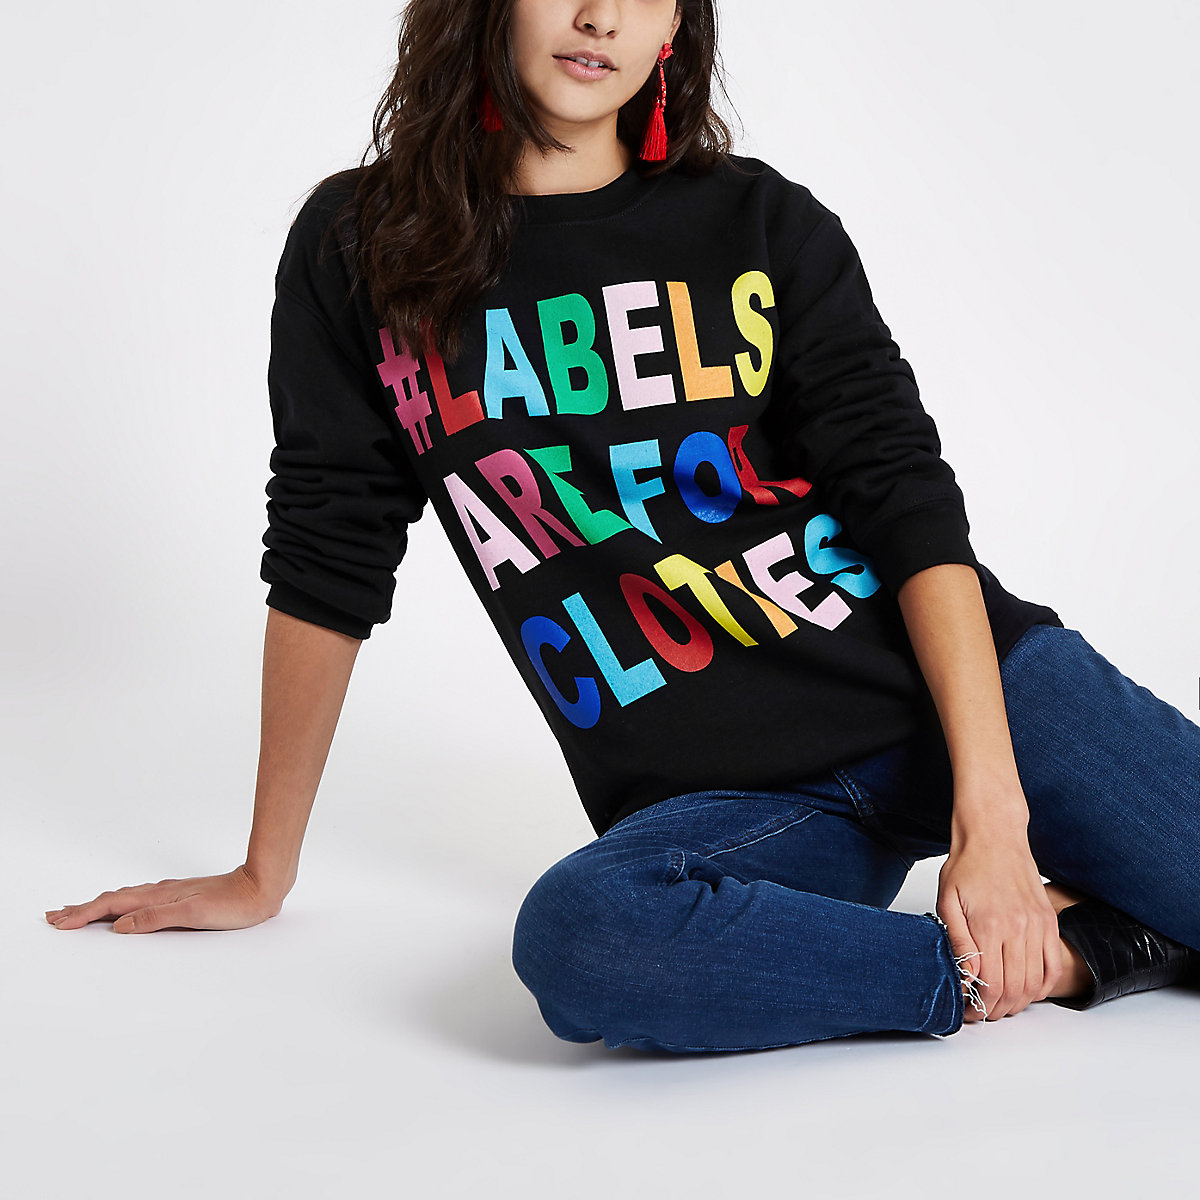 Ditch the Label charity - Zwart sweatshirt